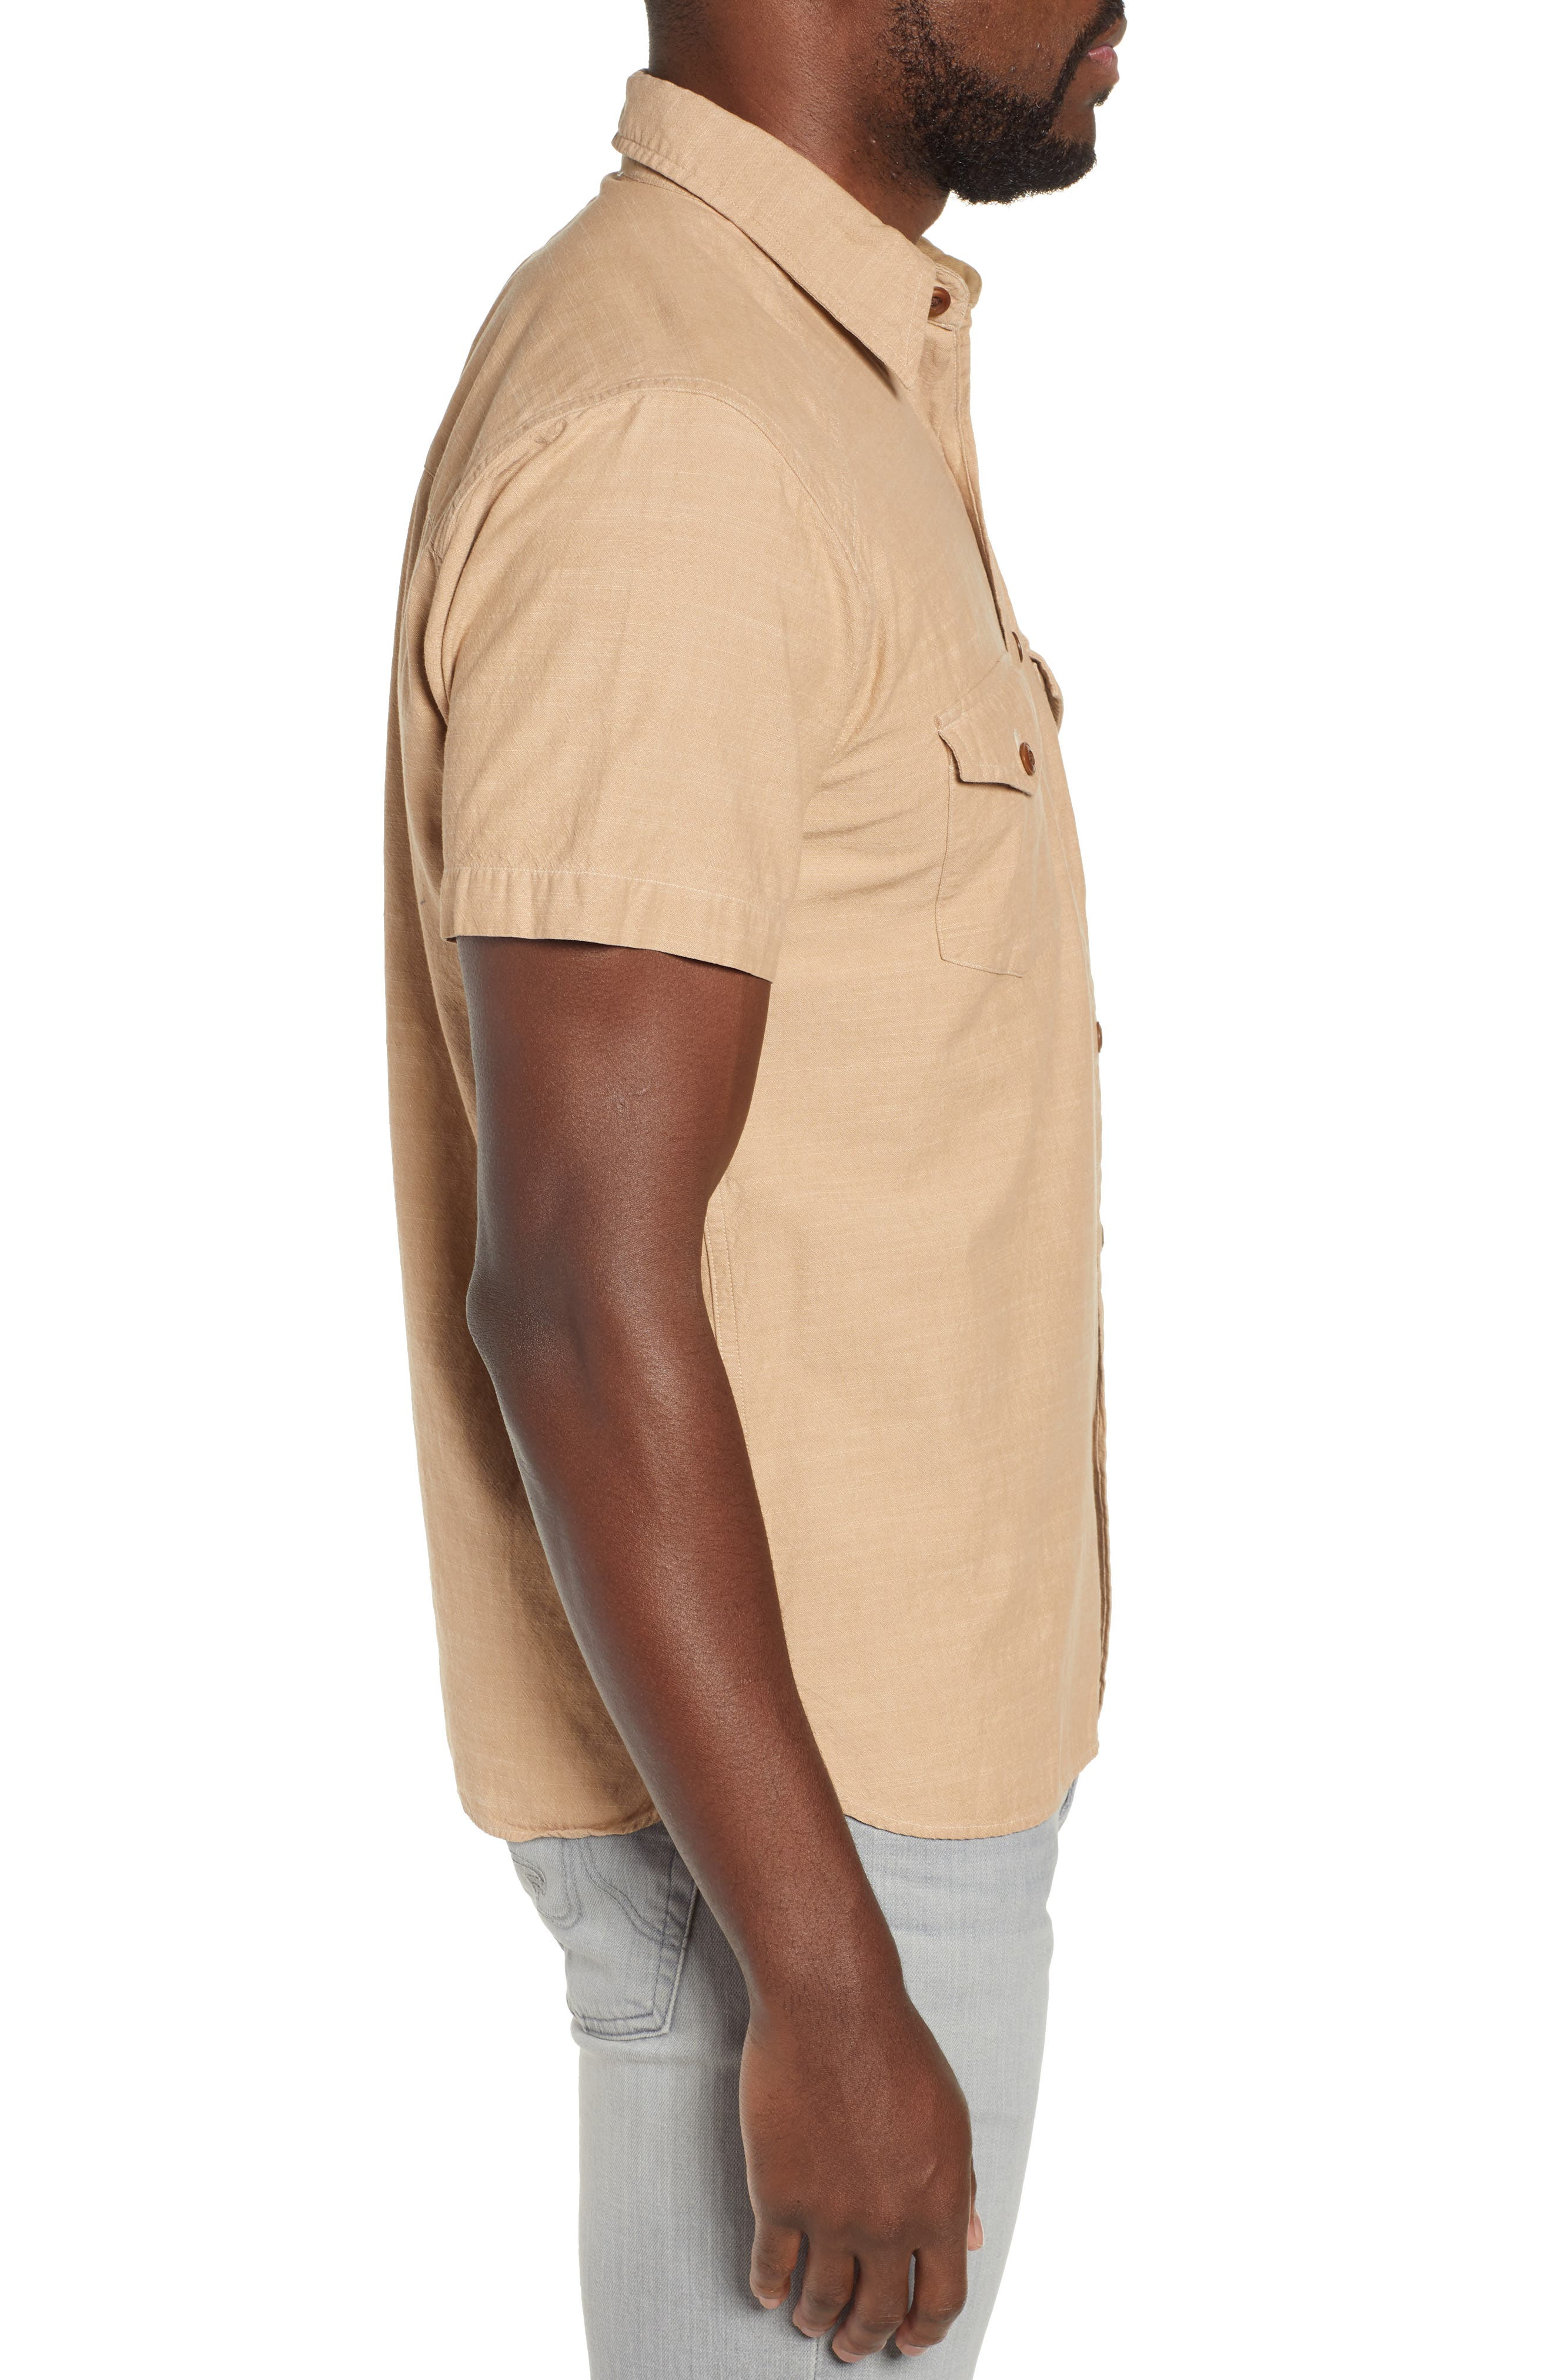 FRYE, Addison Chambray Woven Shirt, Alternate thumbnail 4, color, KRAFT BROWN